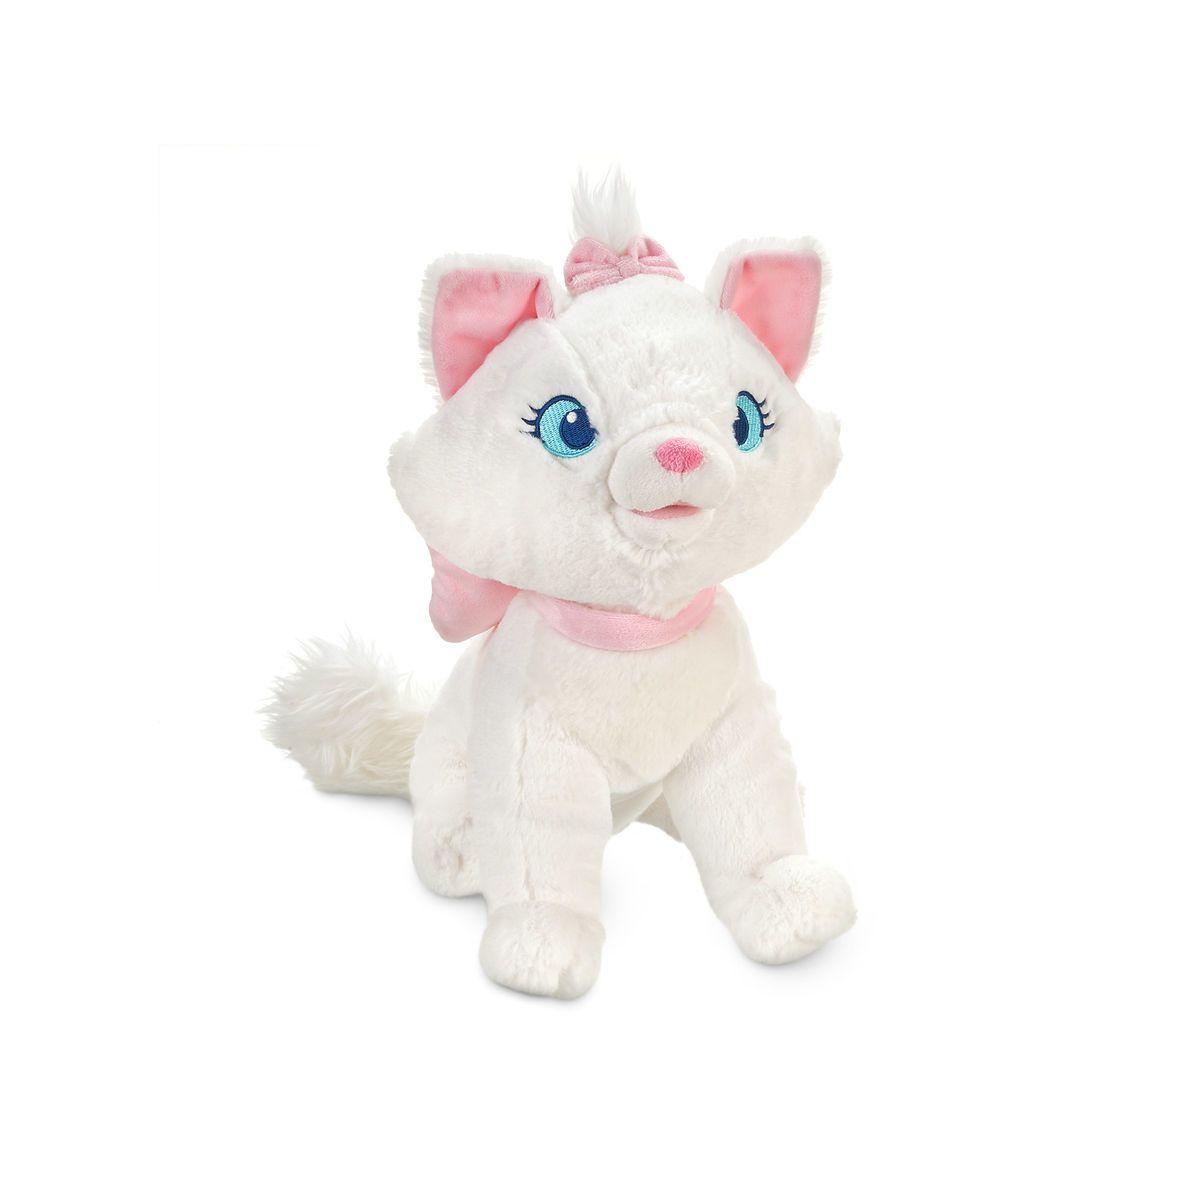 Marie Plush The Aristocats Medium 12 Shopdisney Disney Stuffed Animals Plush Stuffed Animals Aristocats